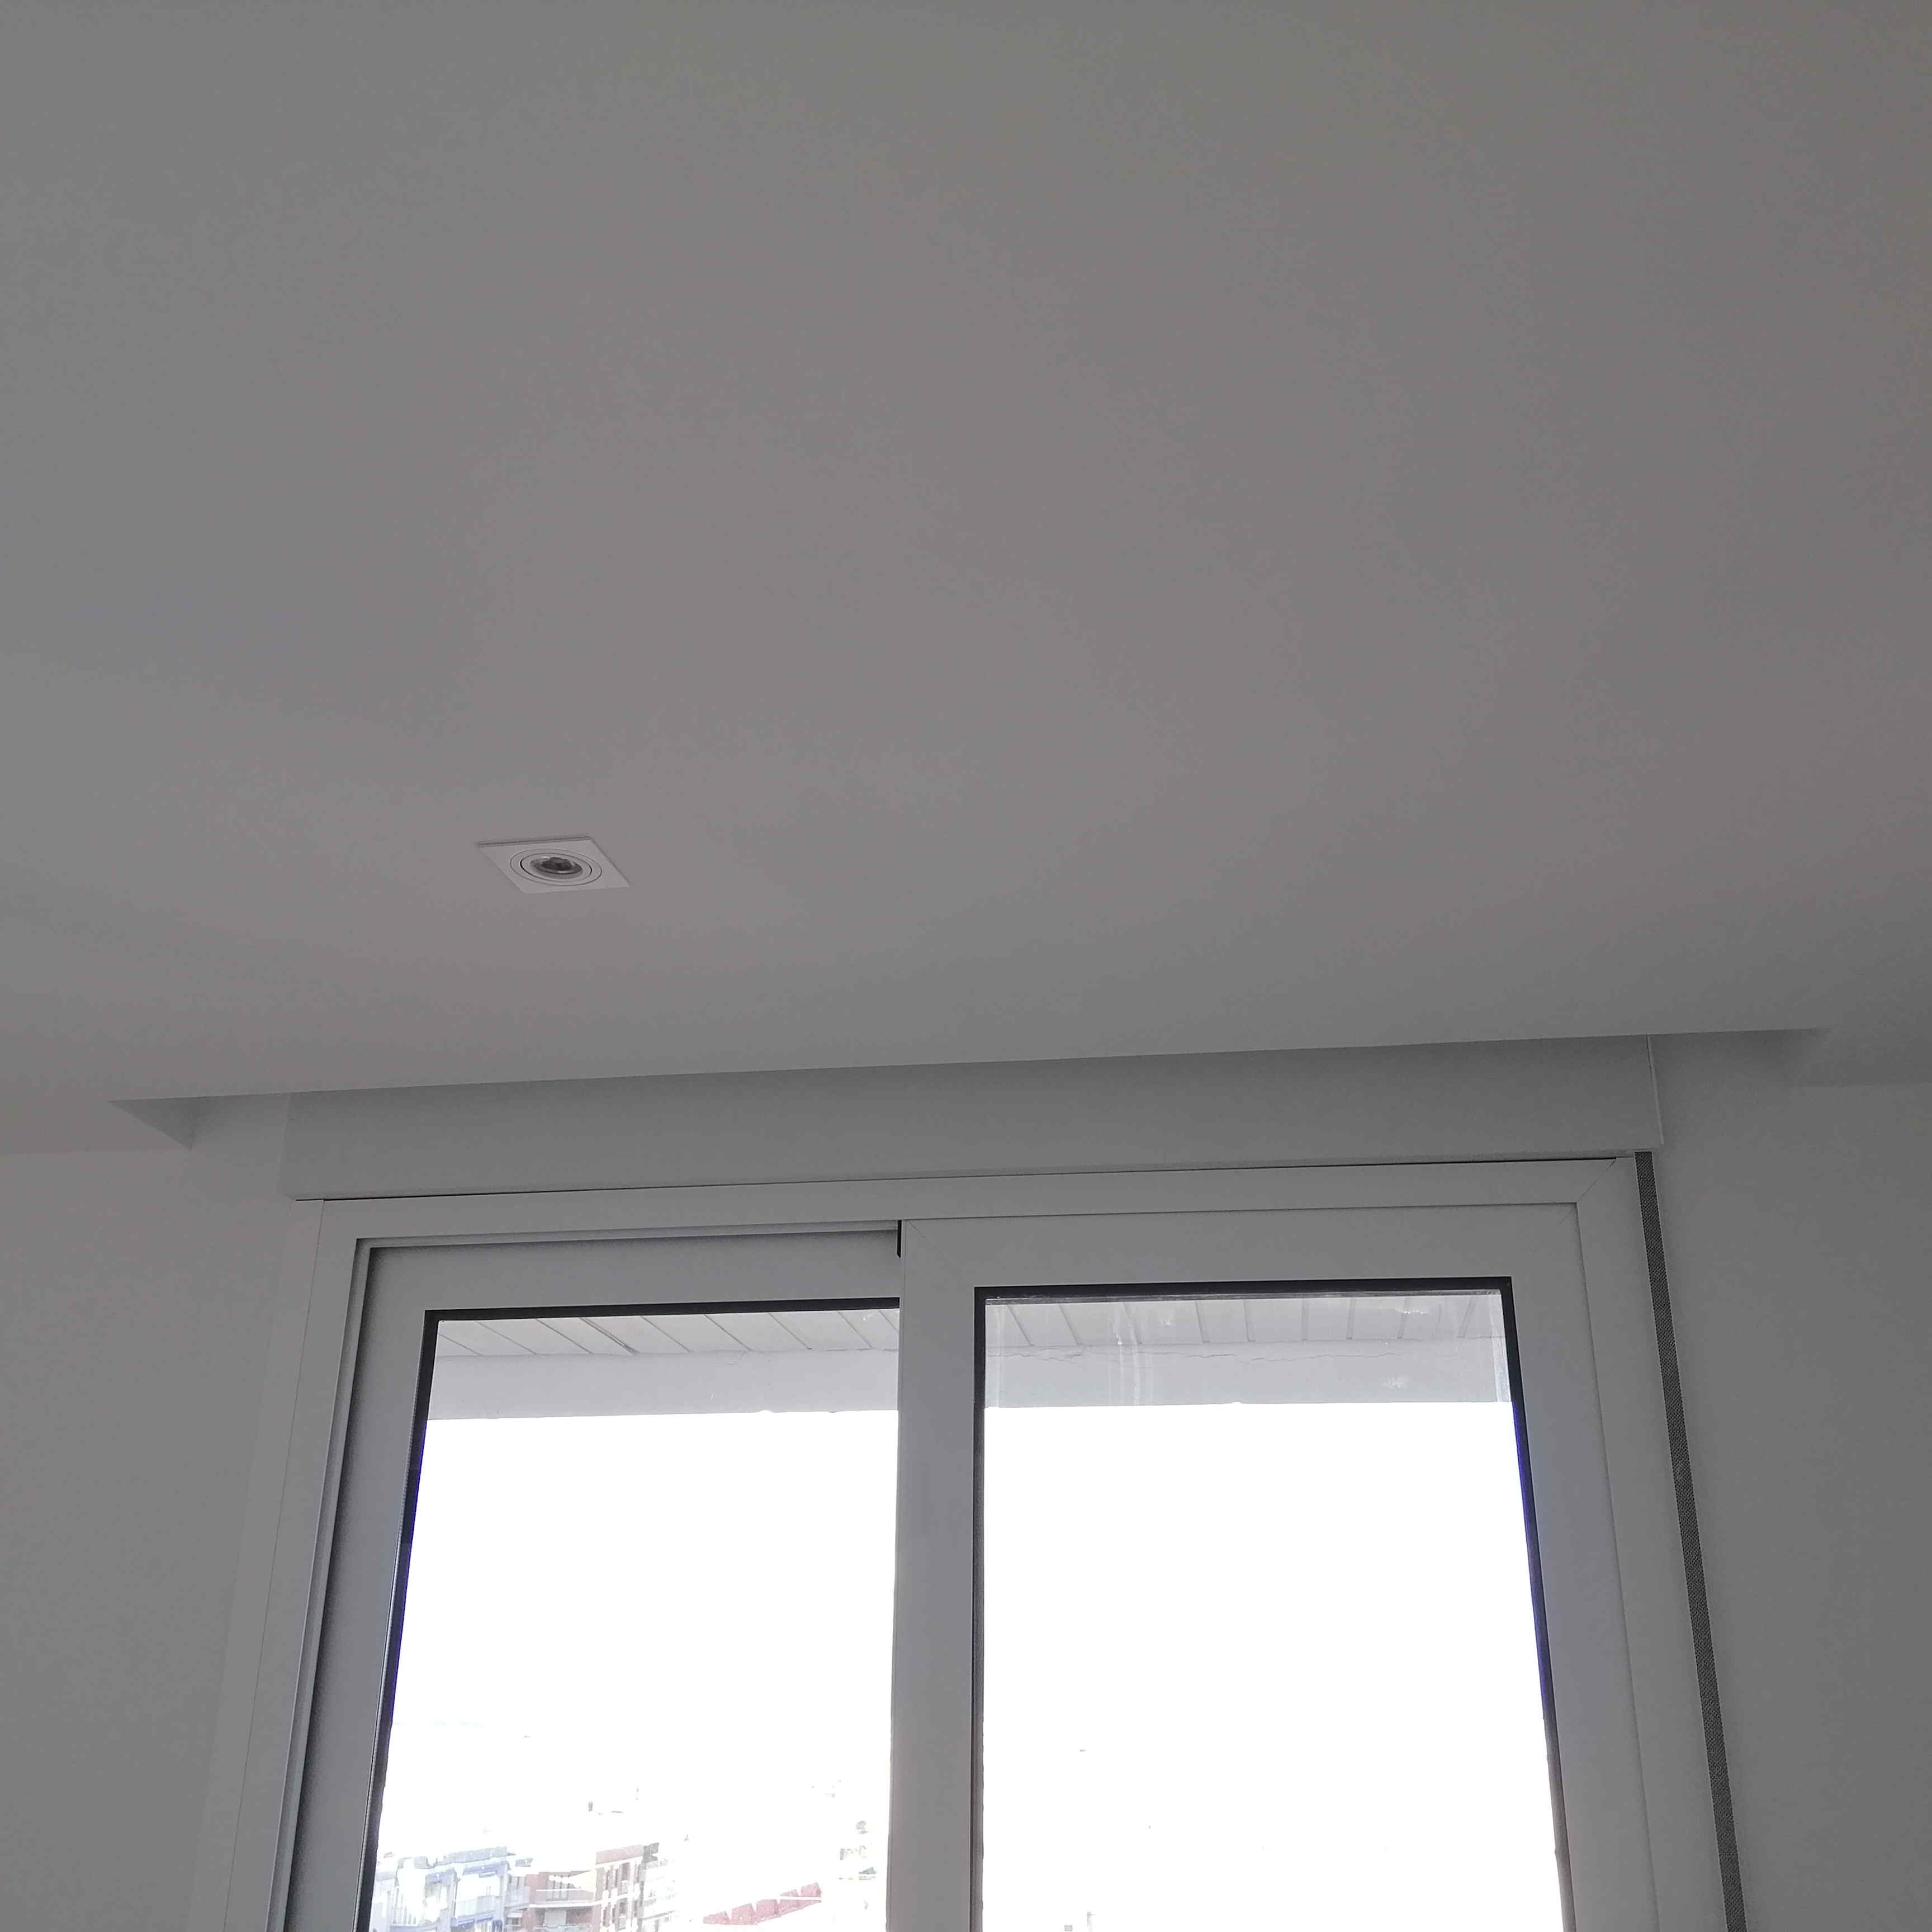 ventana-de-aluminio-corredera-puente-termico-torrevieja-cortinero